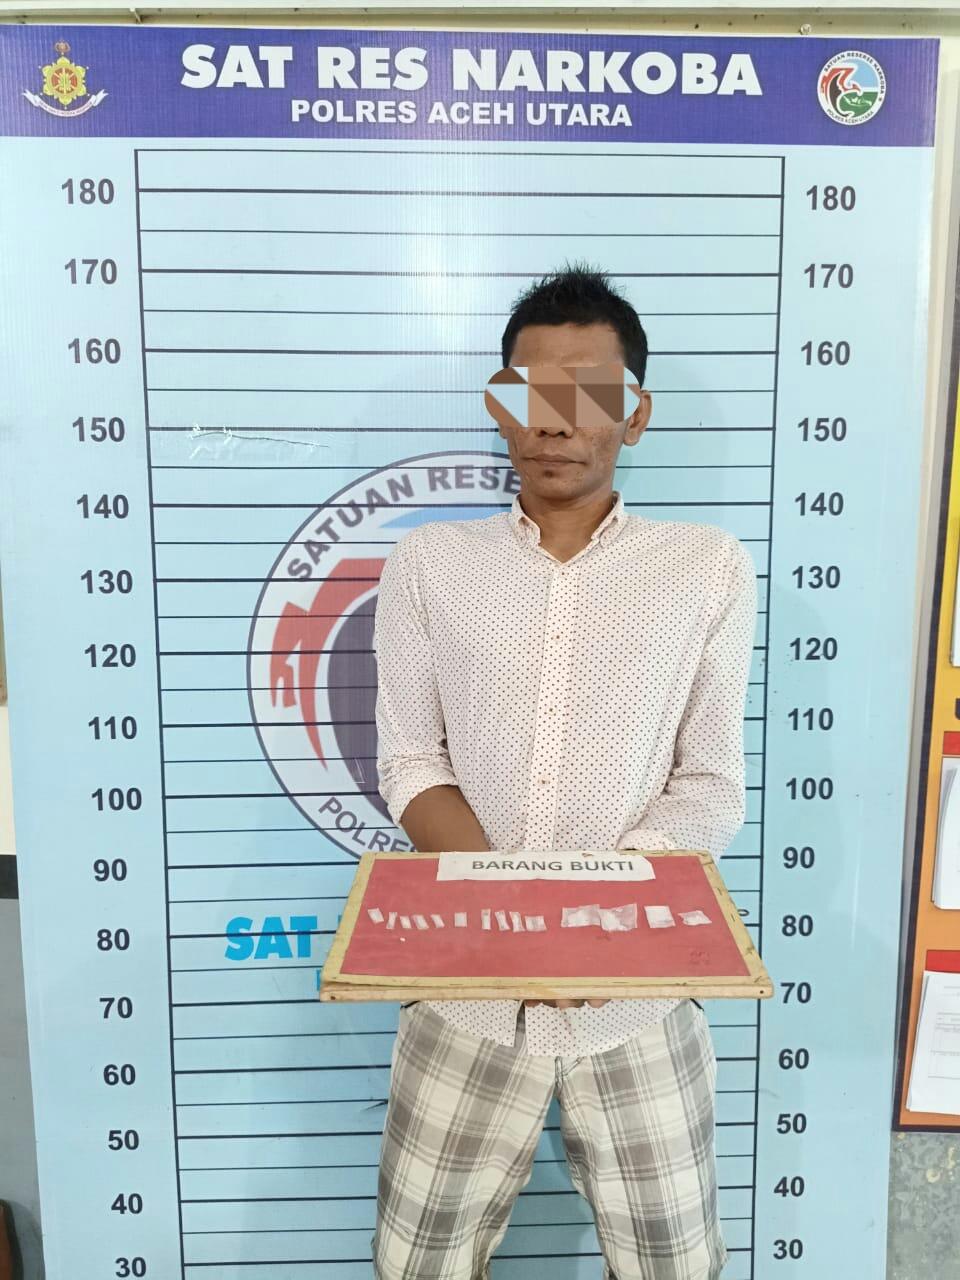 Kerap Resahkan Warga dan Pengaruhi Pemuda Akan Narkoba, Pengedar Sabu di Aceh Utara Ditangkap